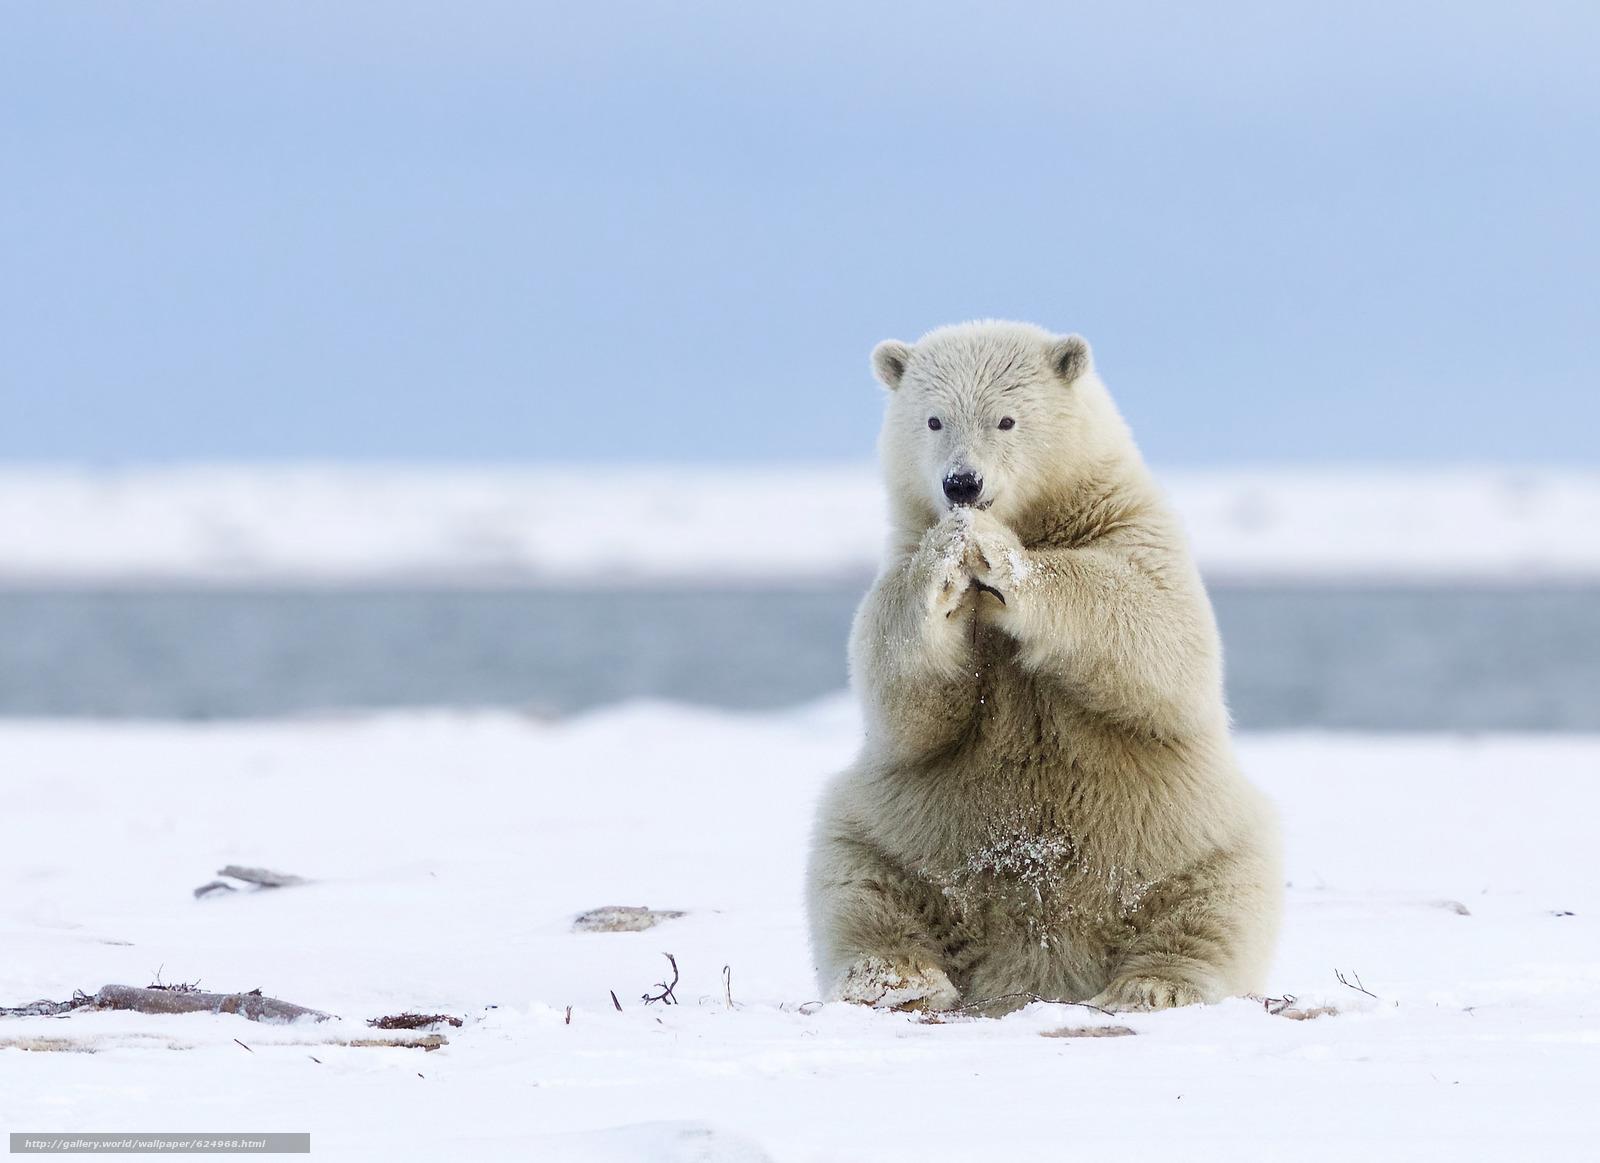 scaricare gli sfondi alaska - photo #5